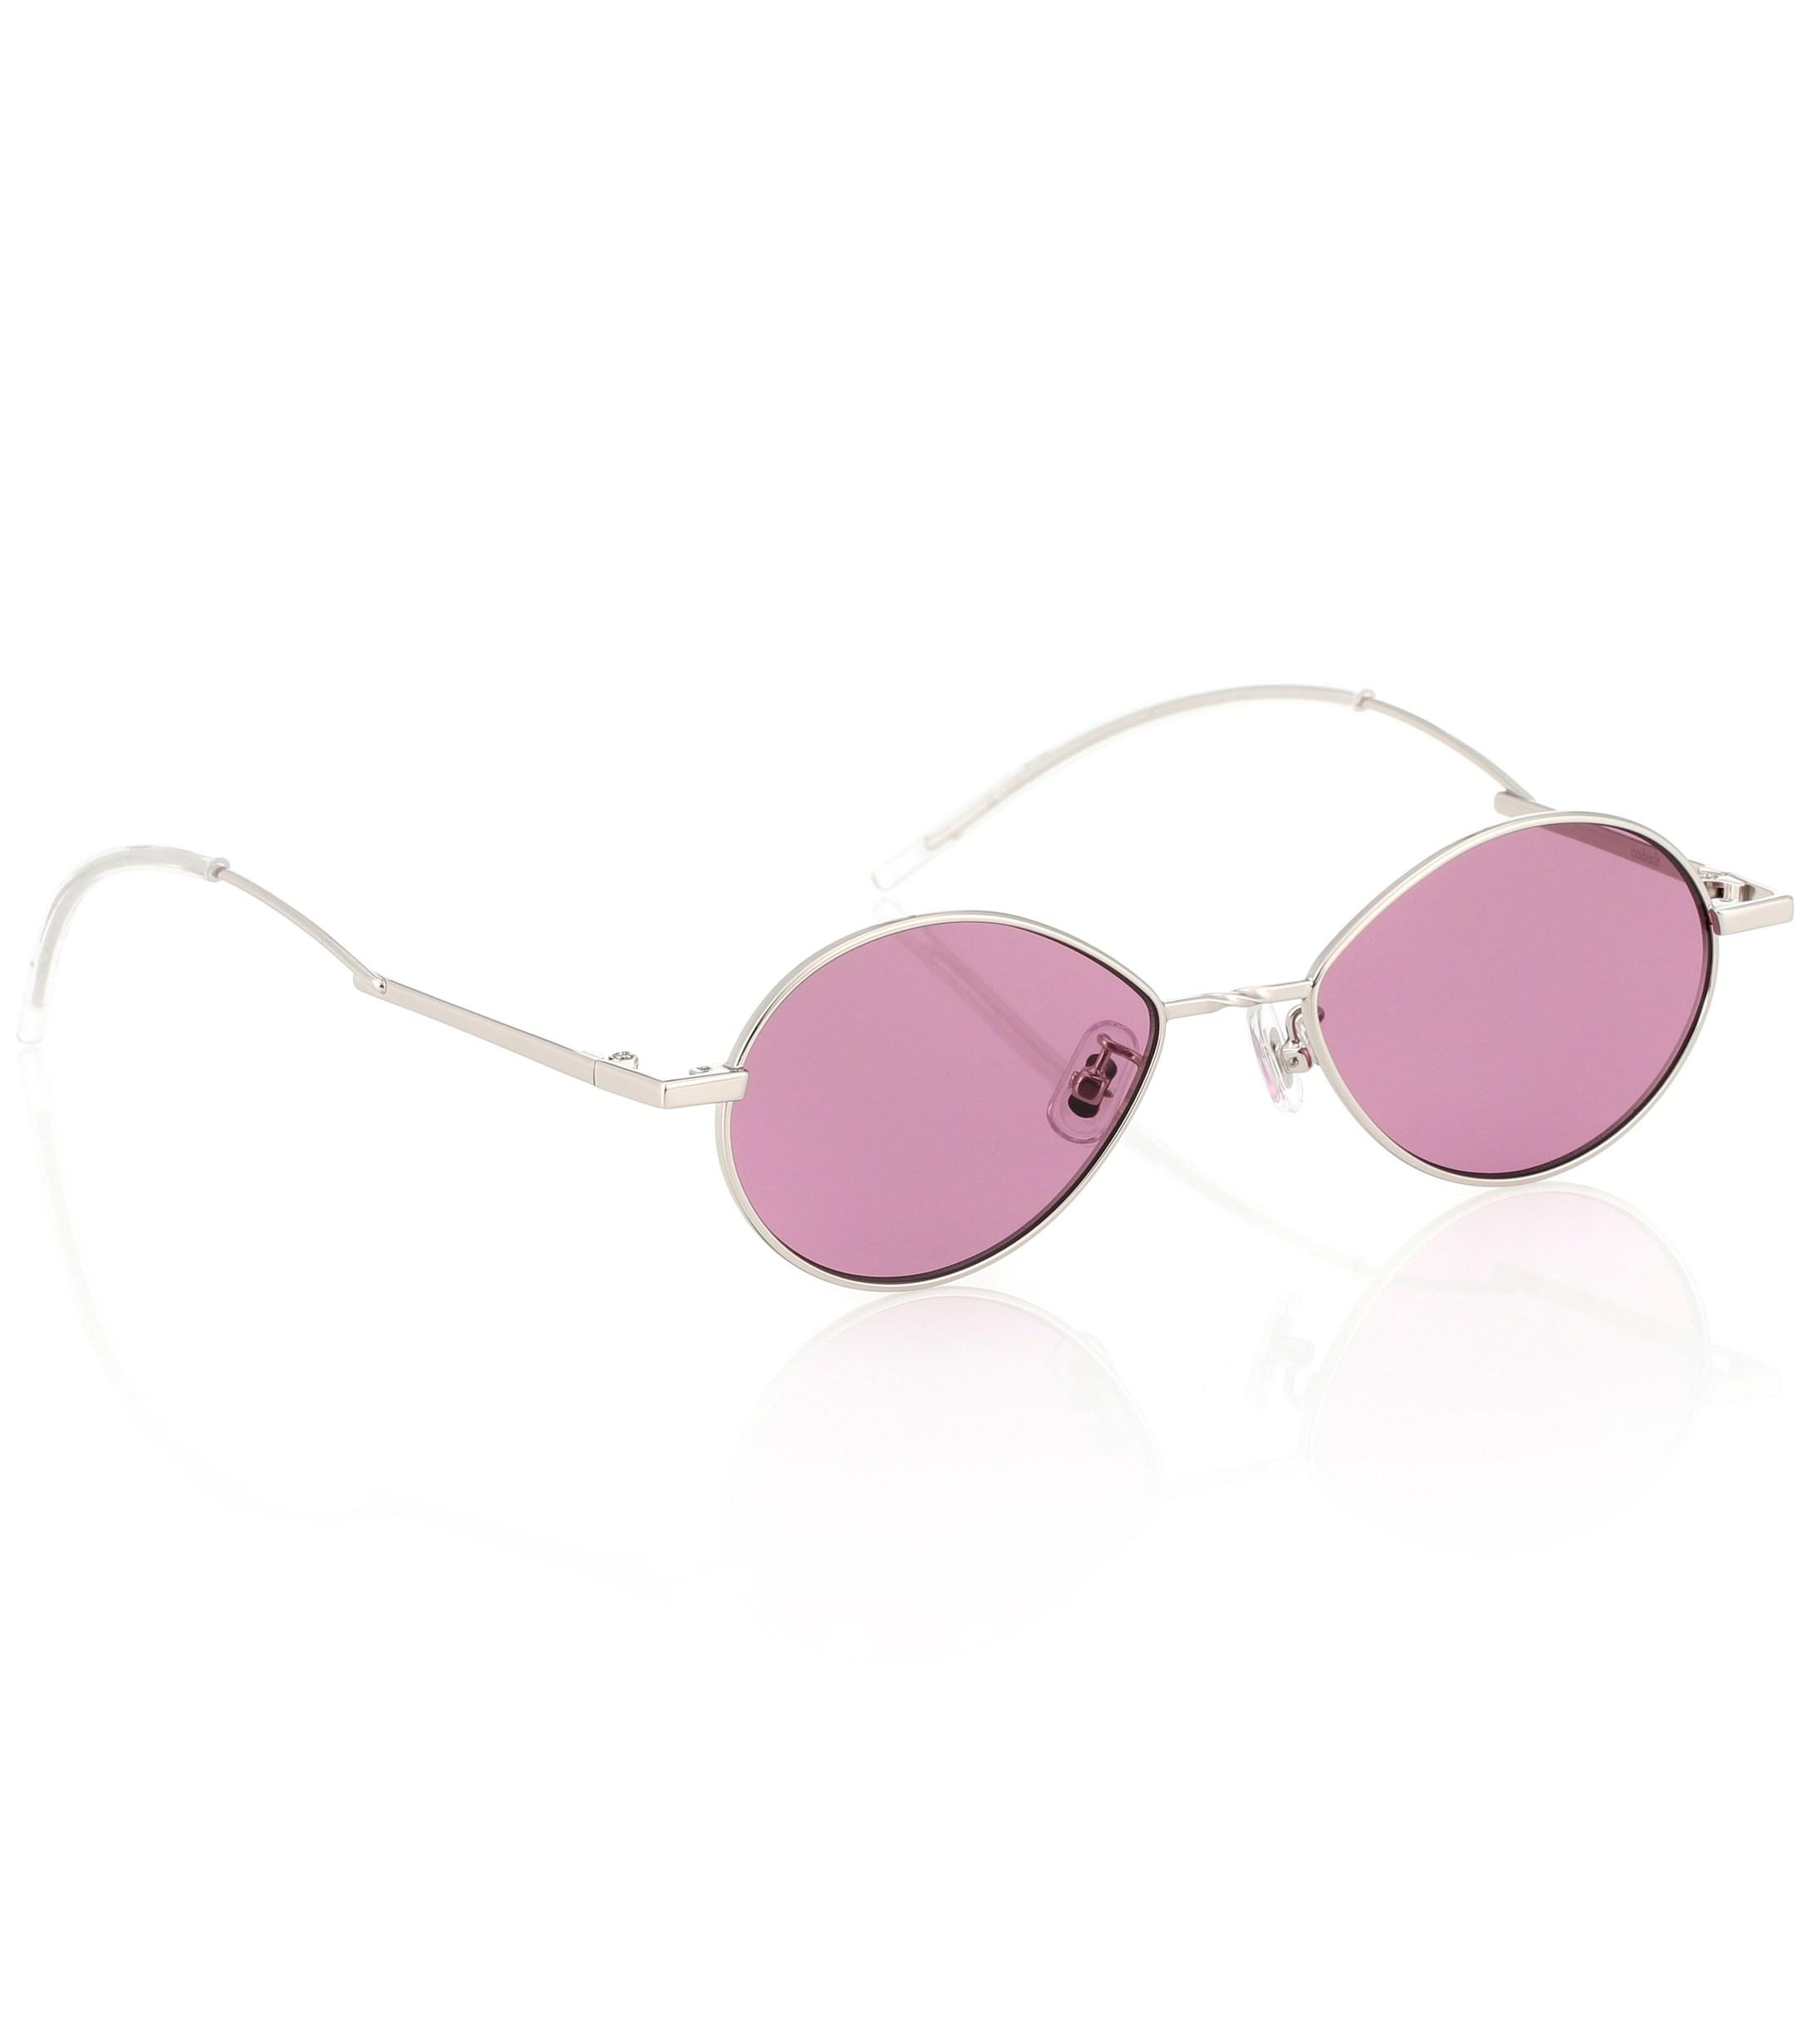 ffa5a1f5dbe0 Gentle Monster - Purple Cobalt 02 Sunglasses - Lyst. View fullscreen